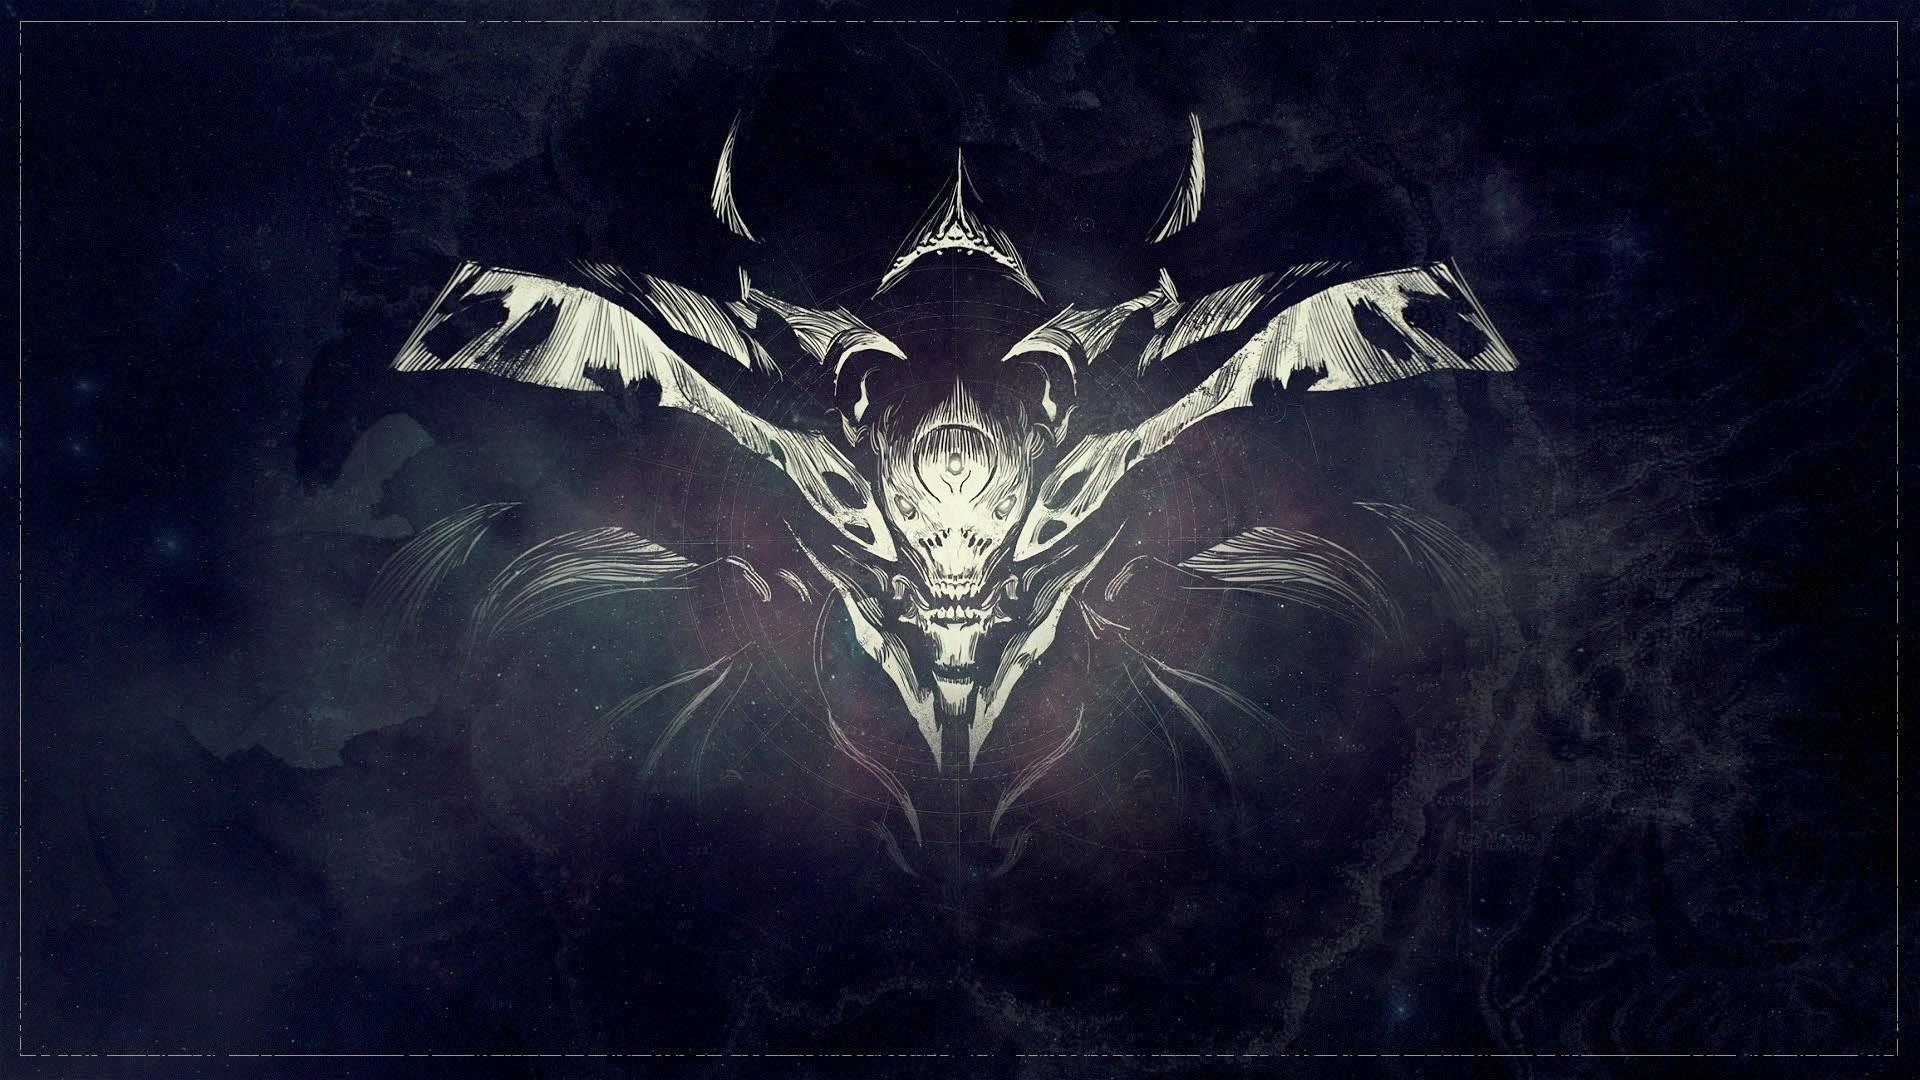 Destiny 1080p Wallpaper (79+ images)